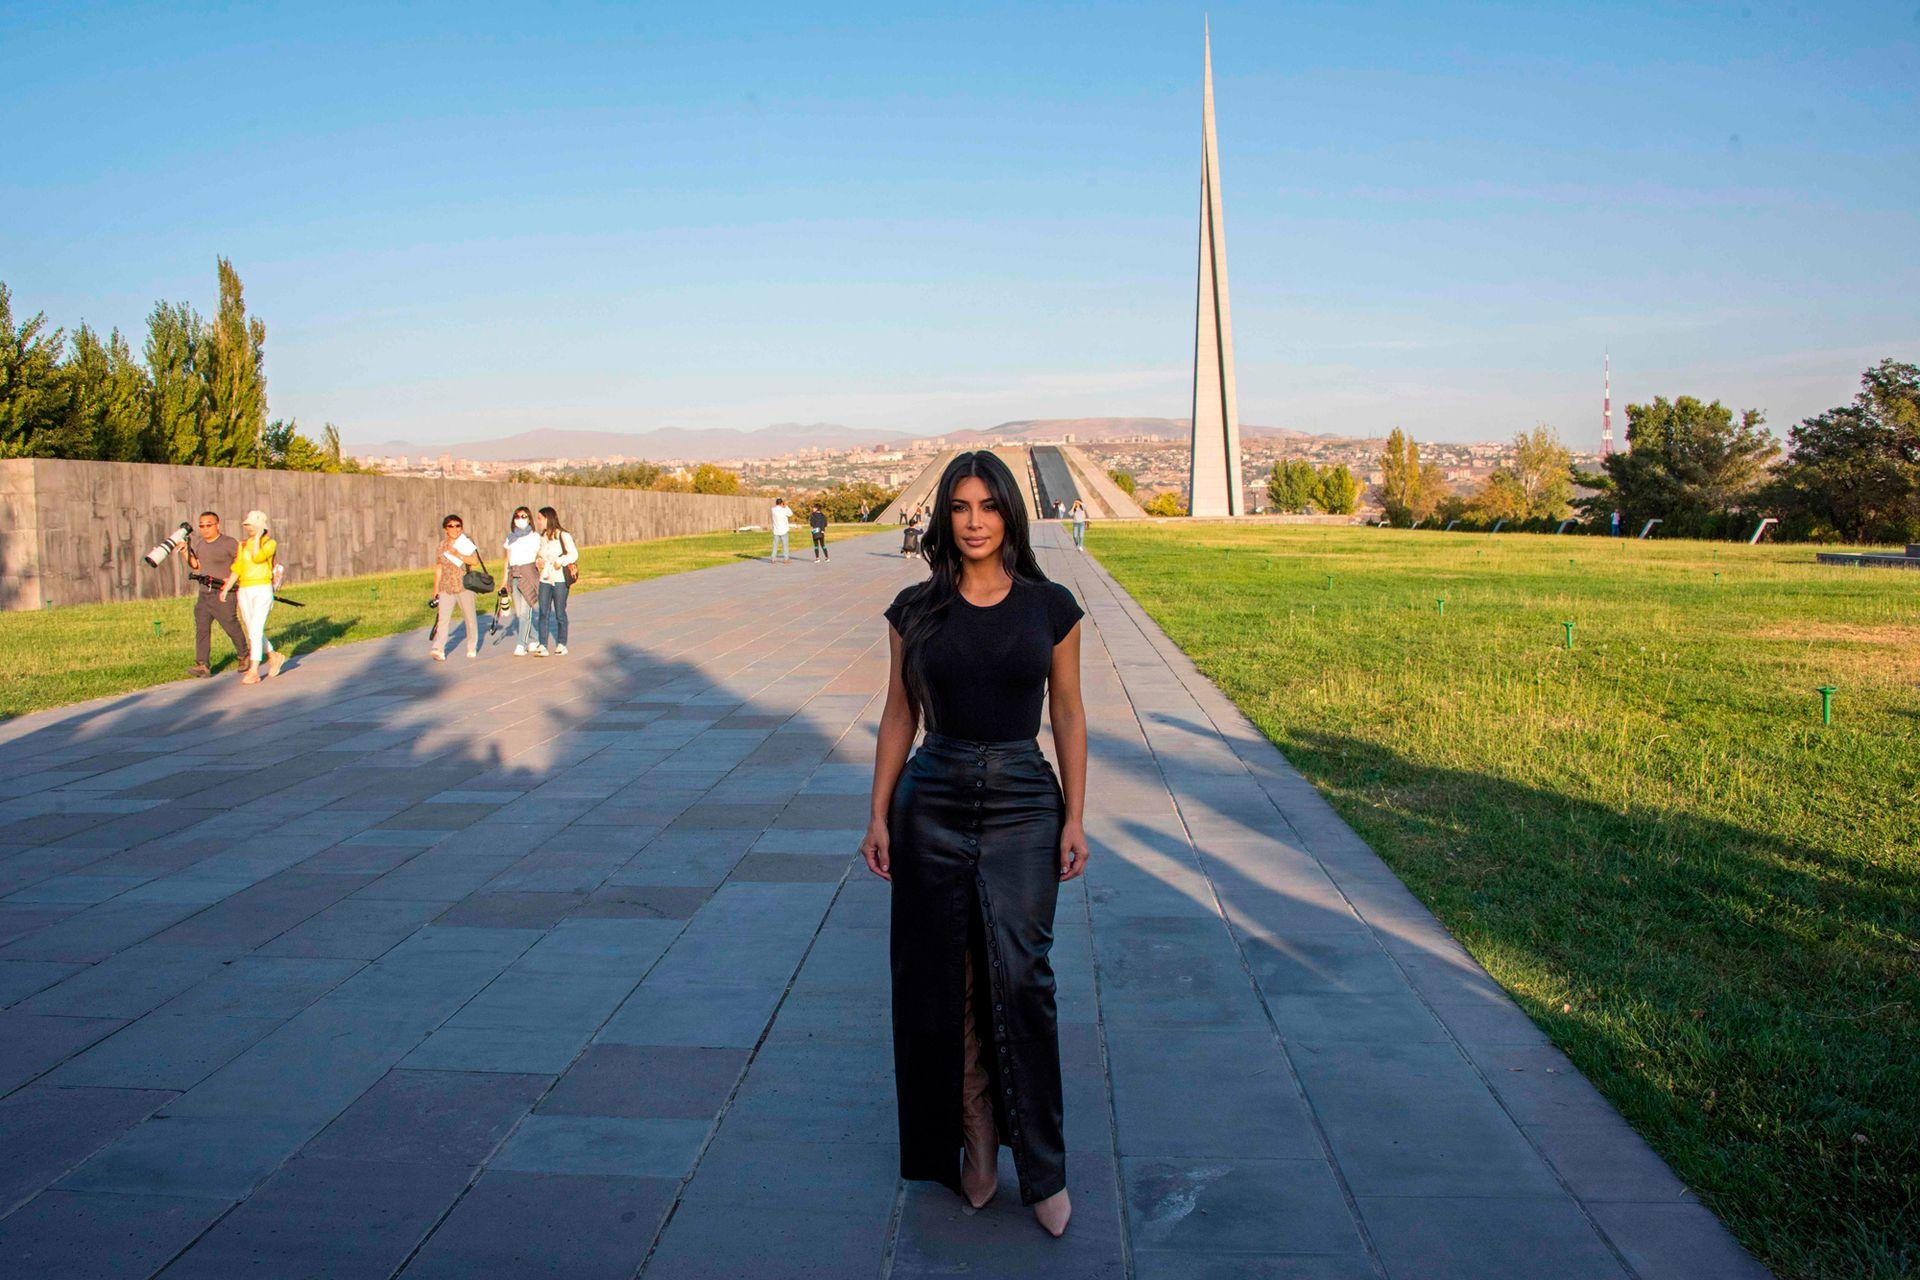 Kim Kardashian viajó a Yereván, se entrevistó con el Primer Ministro Nikol Pashinian y visitó el Monumento al Genocidio Armenio